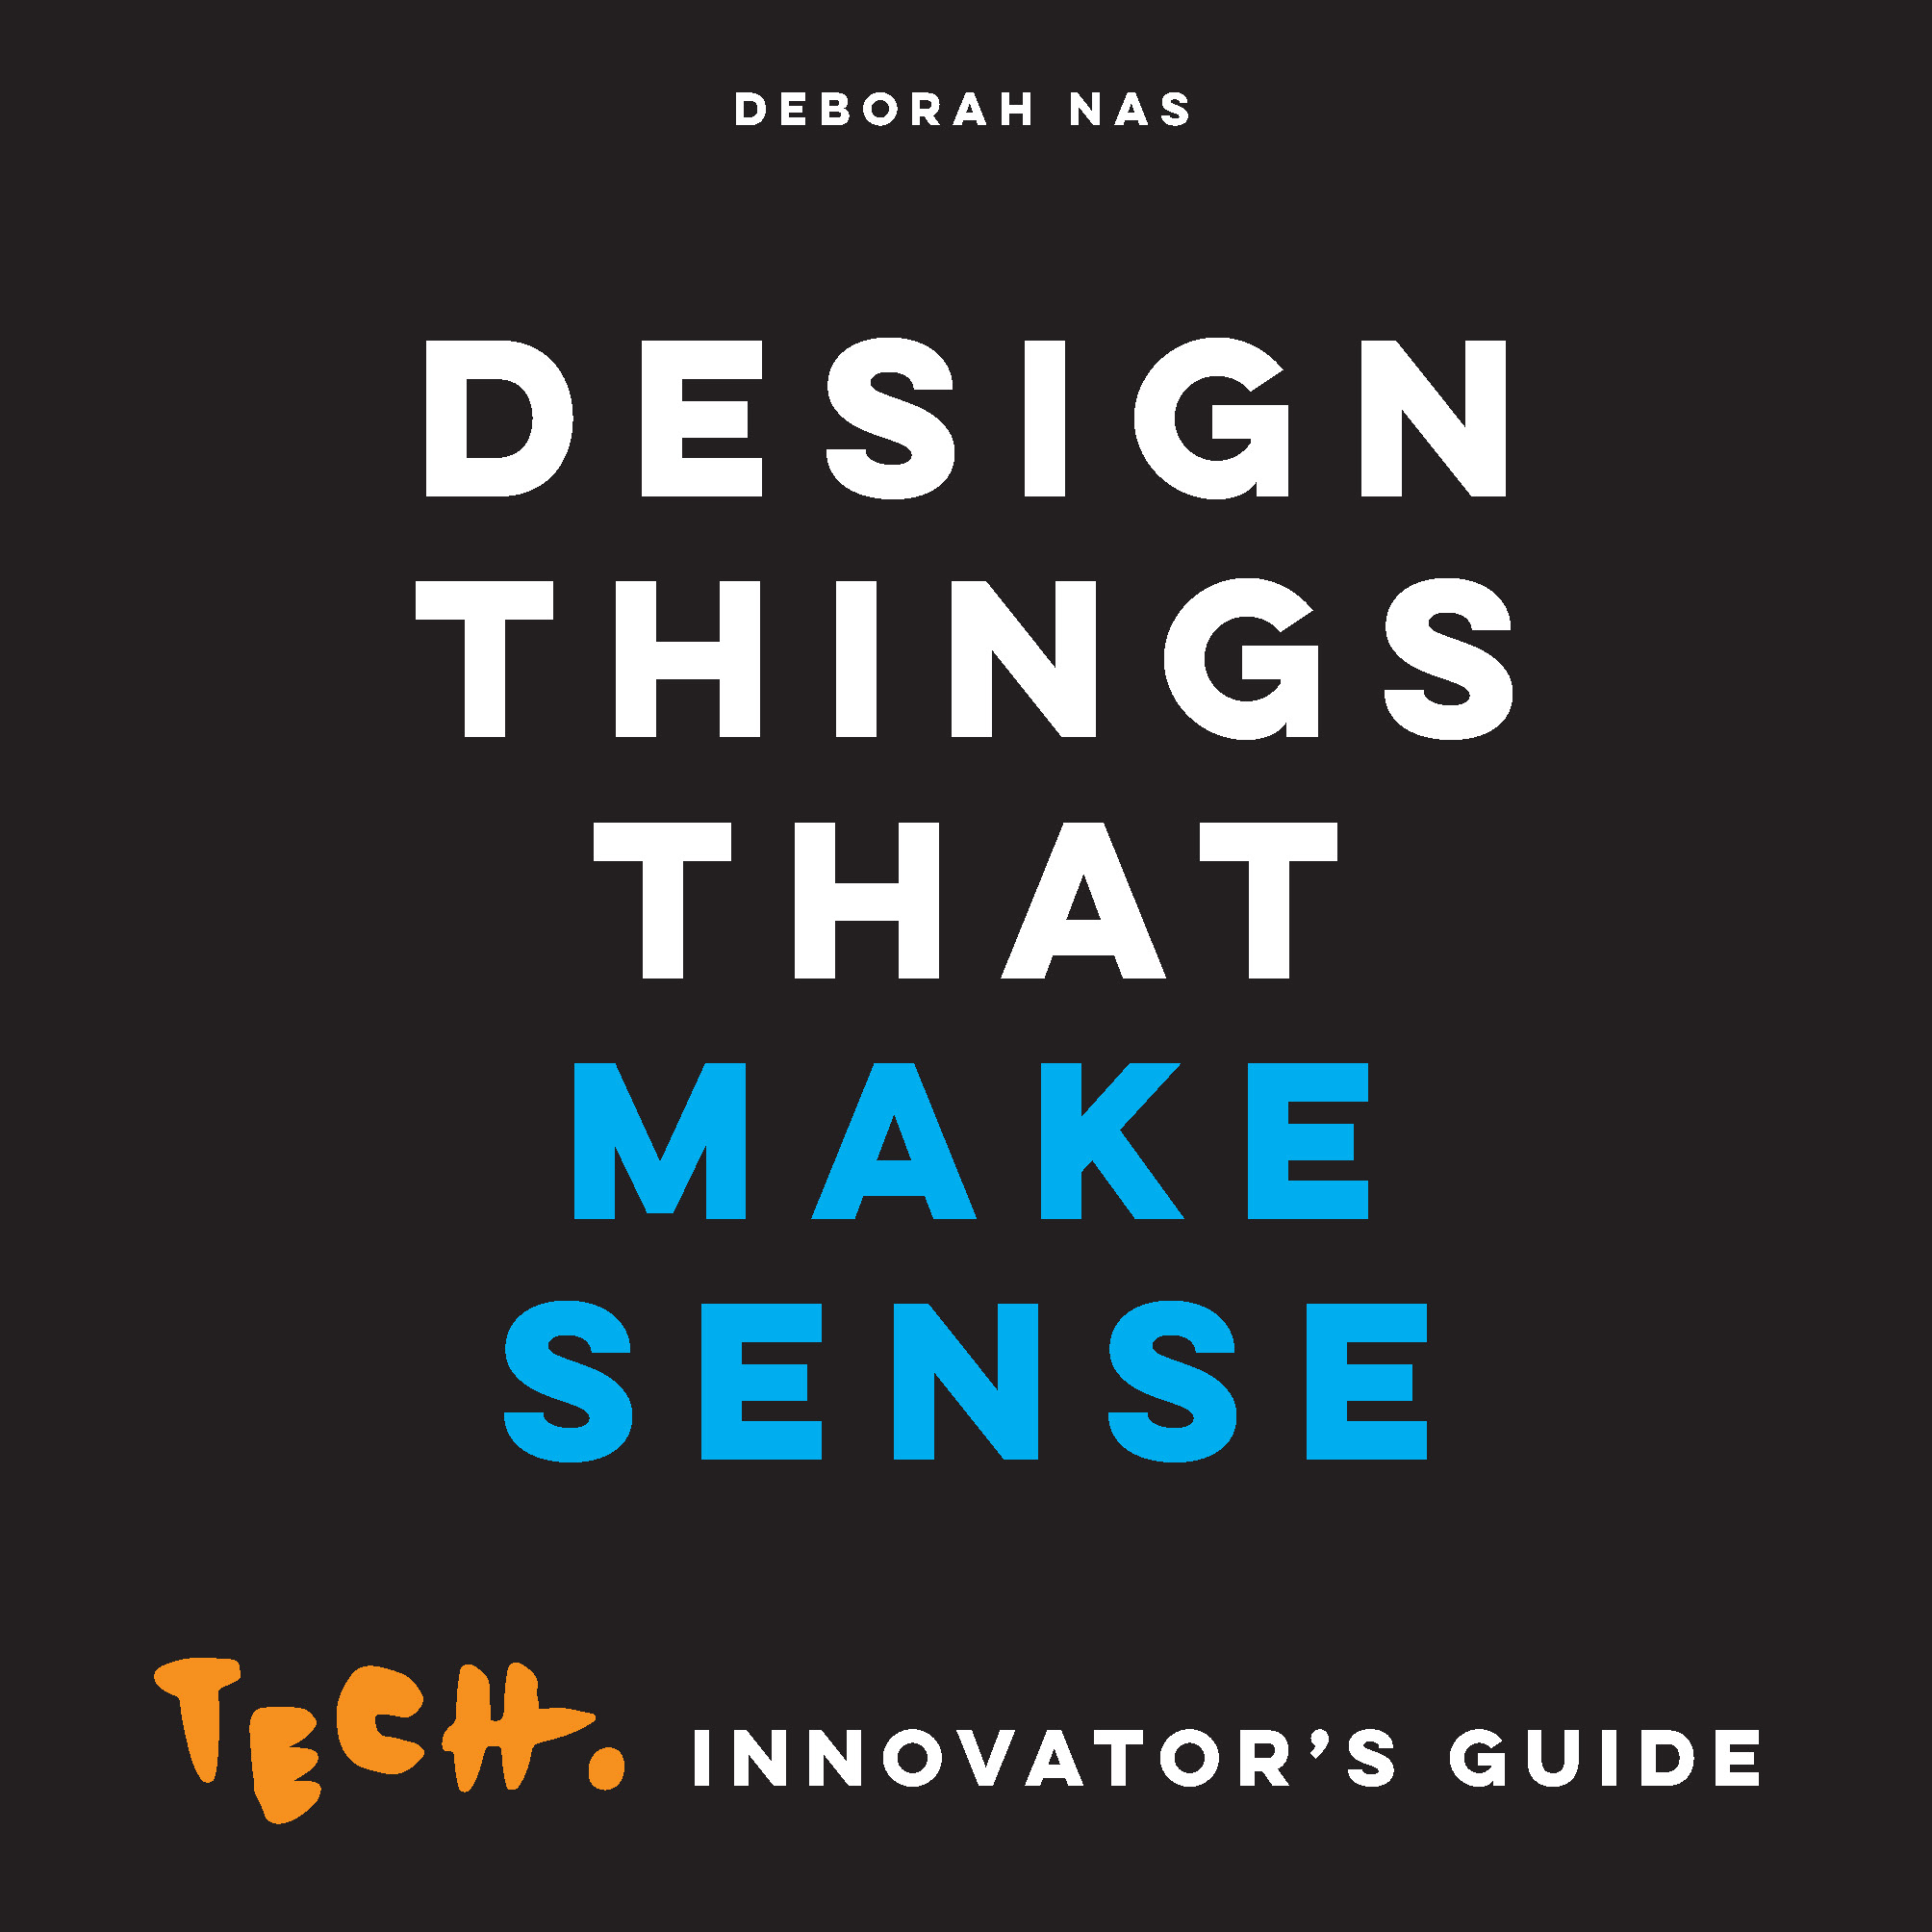 Design Things that Make Sense - Product Thumbnail